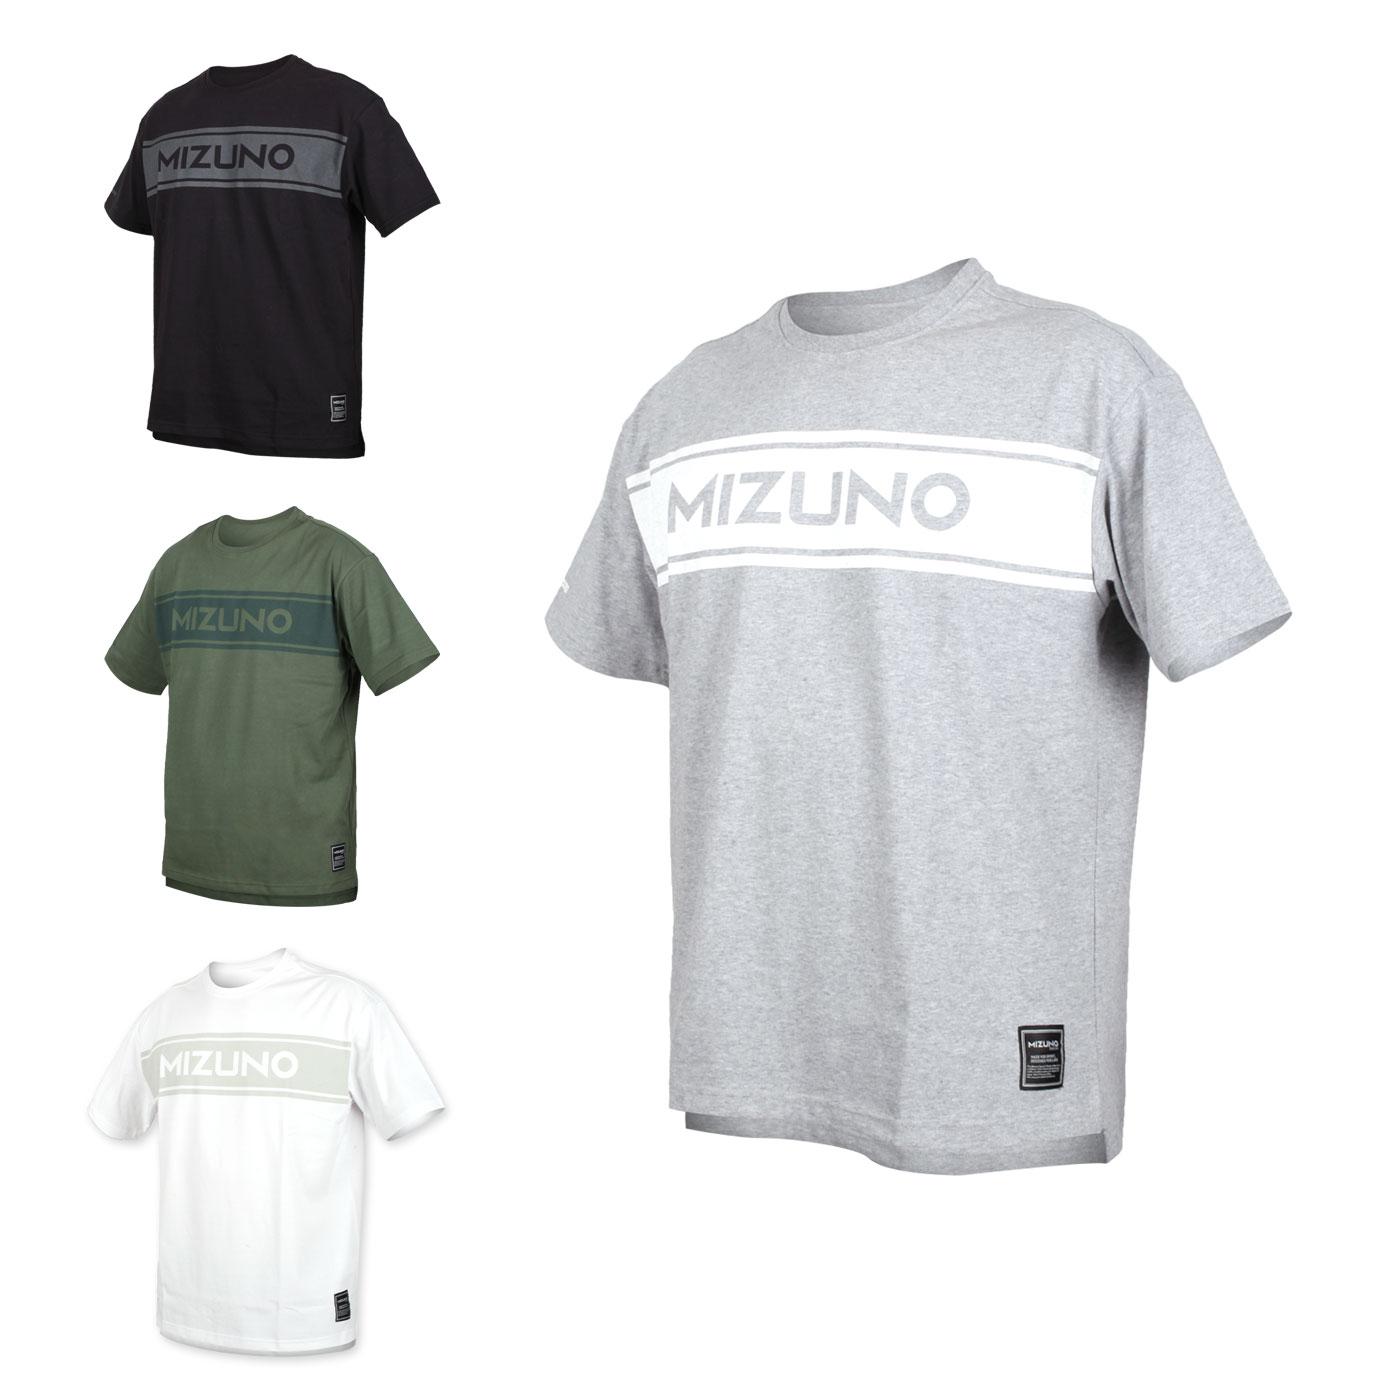 MIZUNO 男款1906系列短袖T恤 D2TA000301